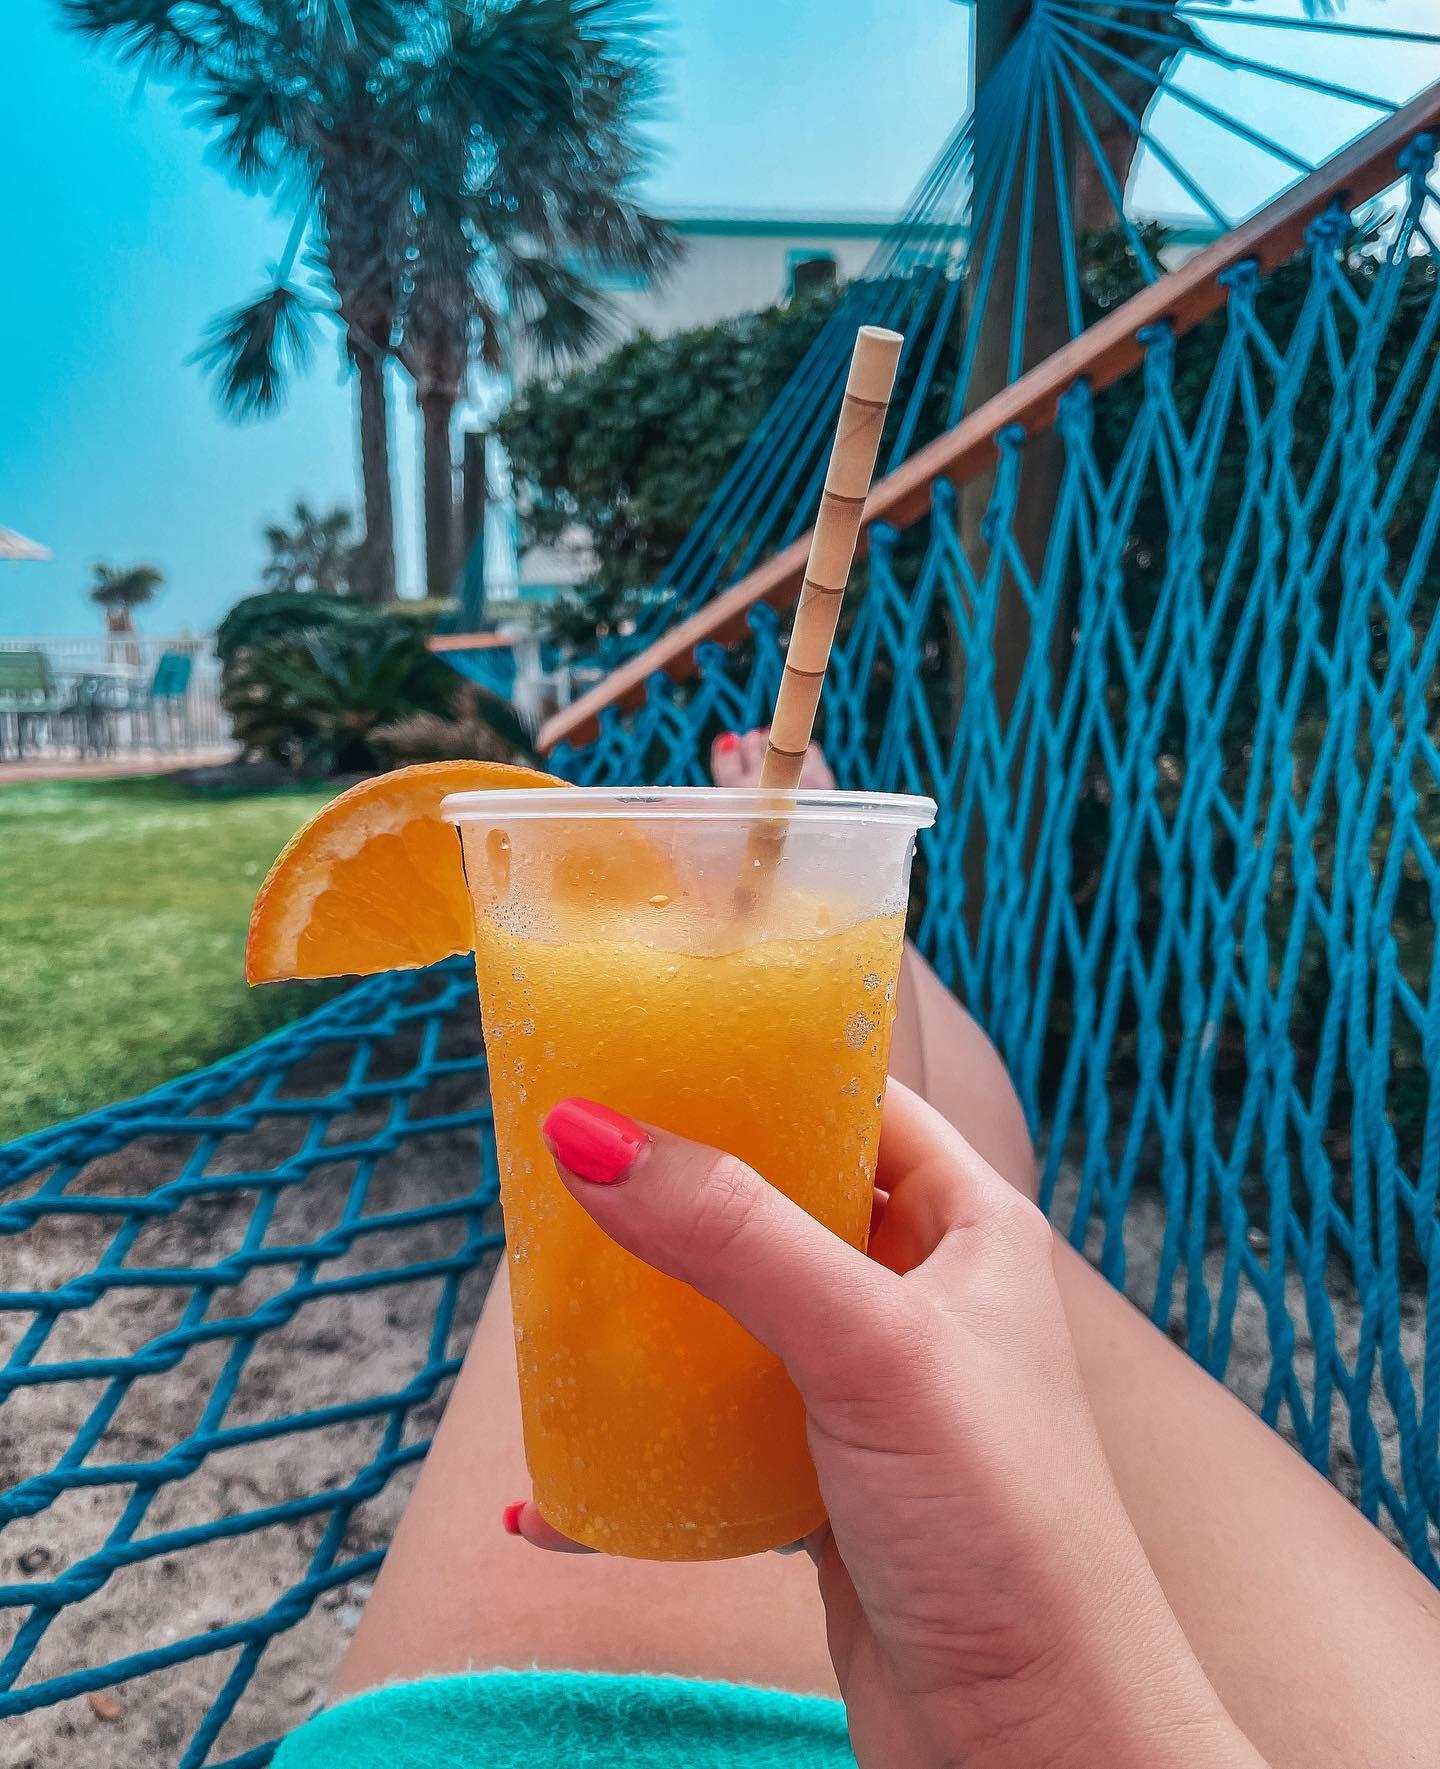 Relaxing on hammock at Holiday Inn Express  Orange Beach enjoying a mango colada